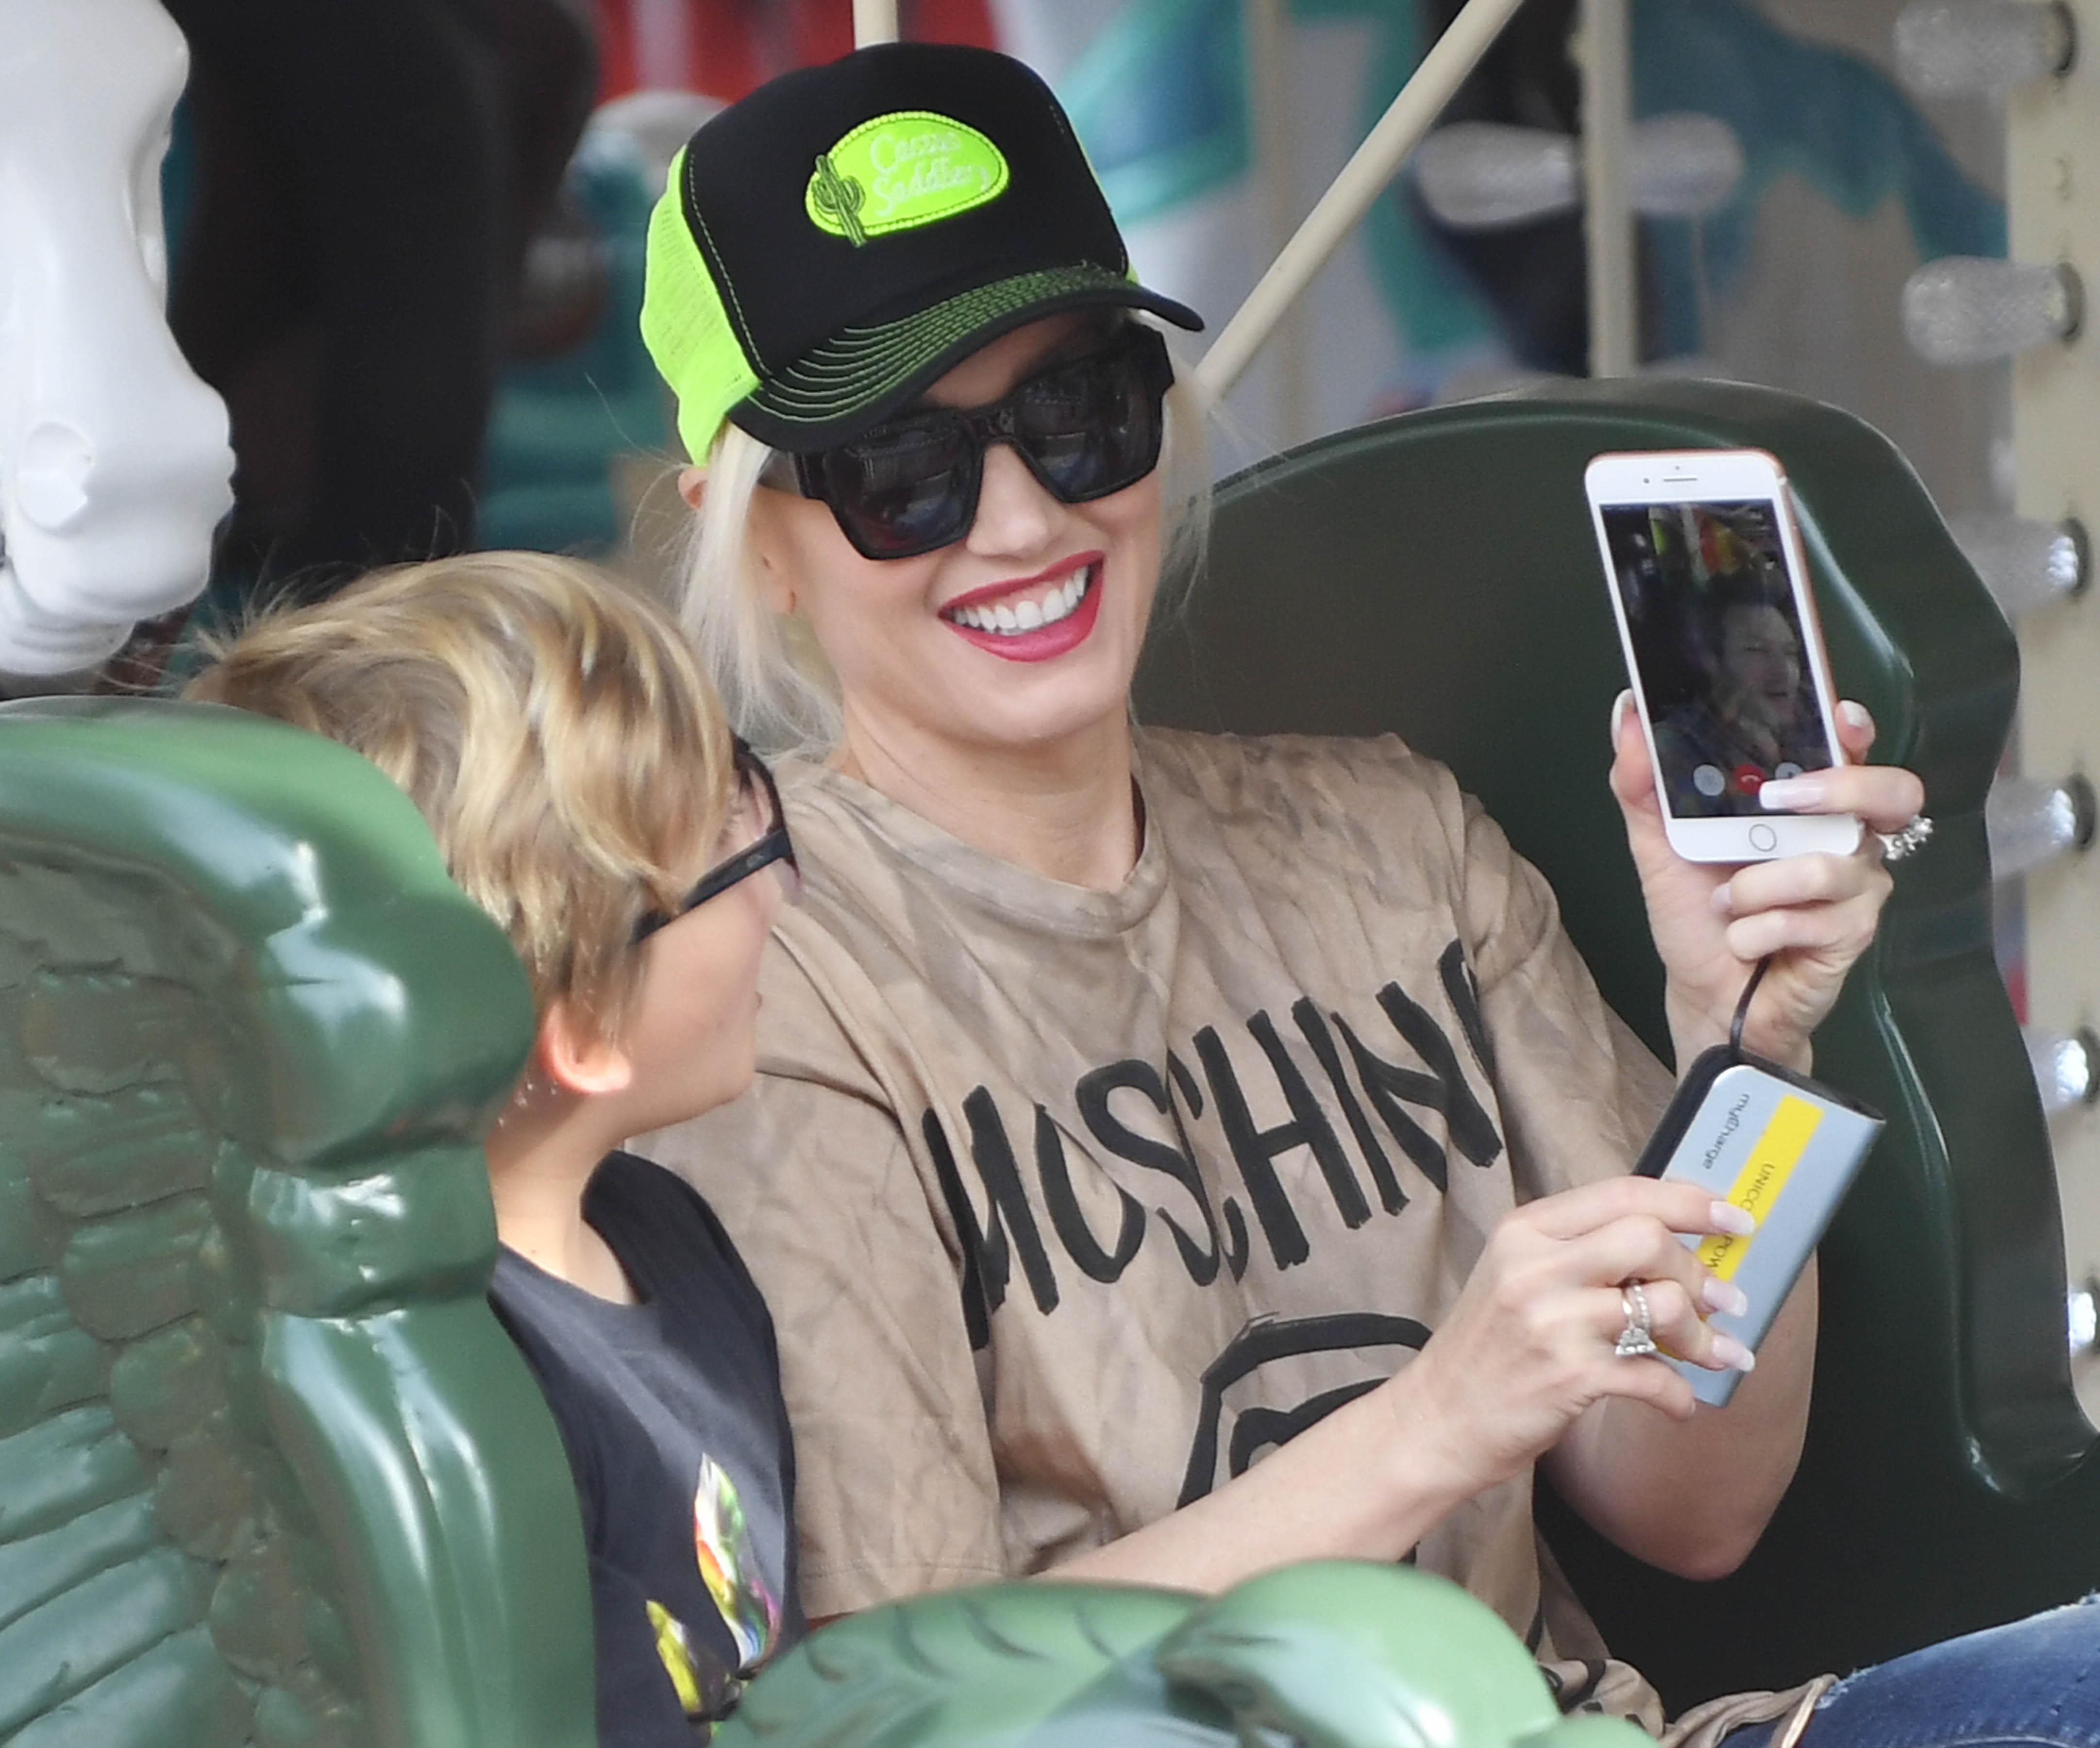 Gwen Stefani Has A Blast With Her Boys At Six Flags Magic Mountain Amusement Park